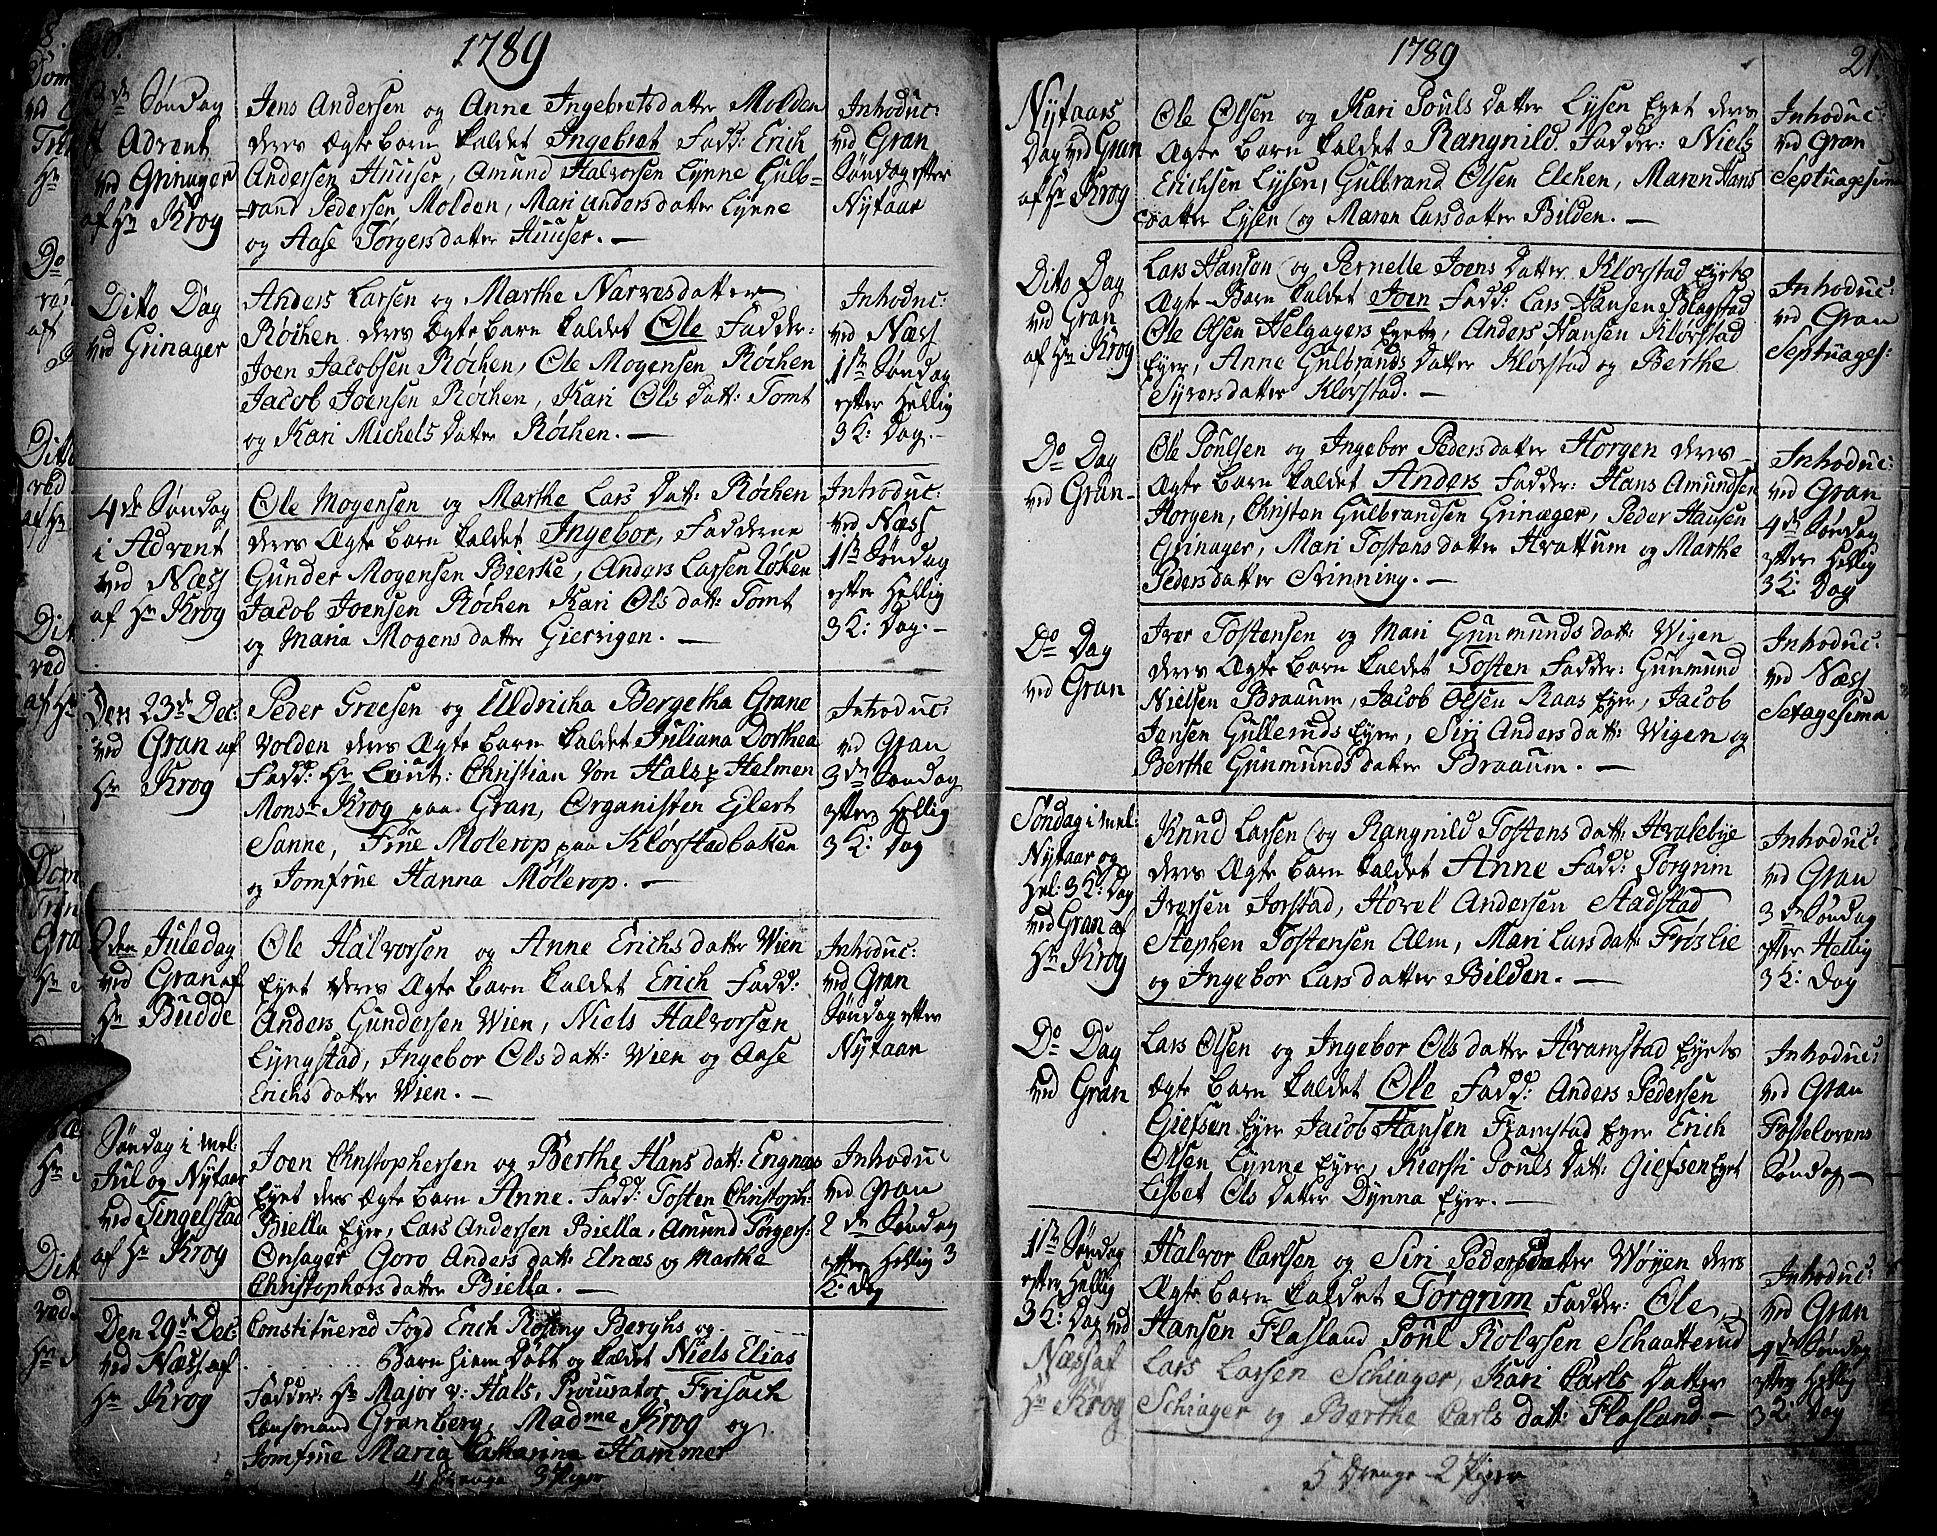 SAH, Gran prestekontor, Ministerialbok nr. 6, 1787-1824, s. 20-21